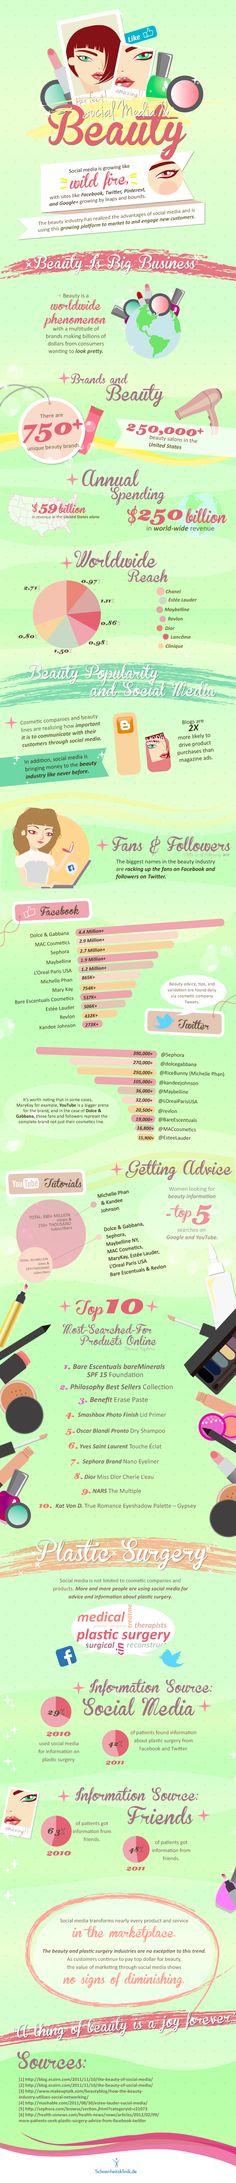 Beauty & Social Media